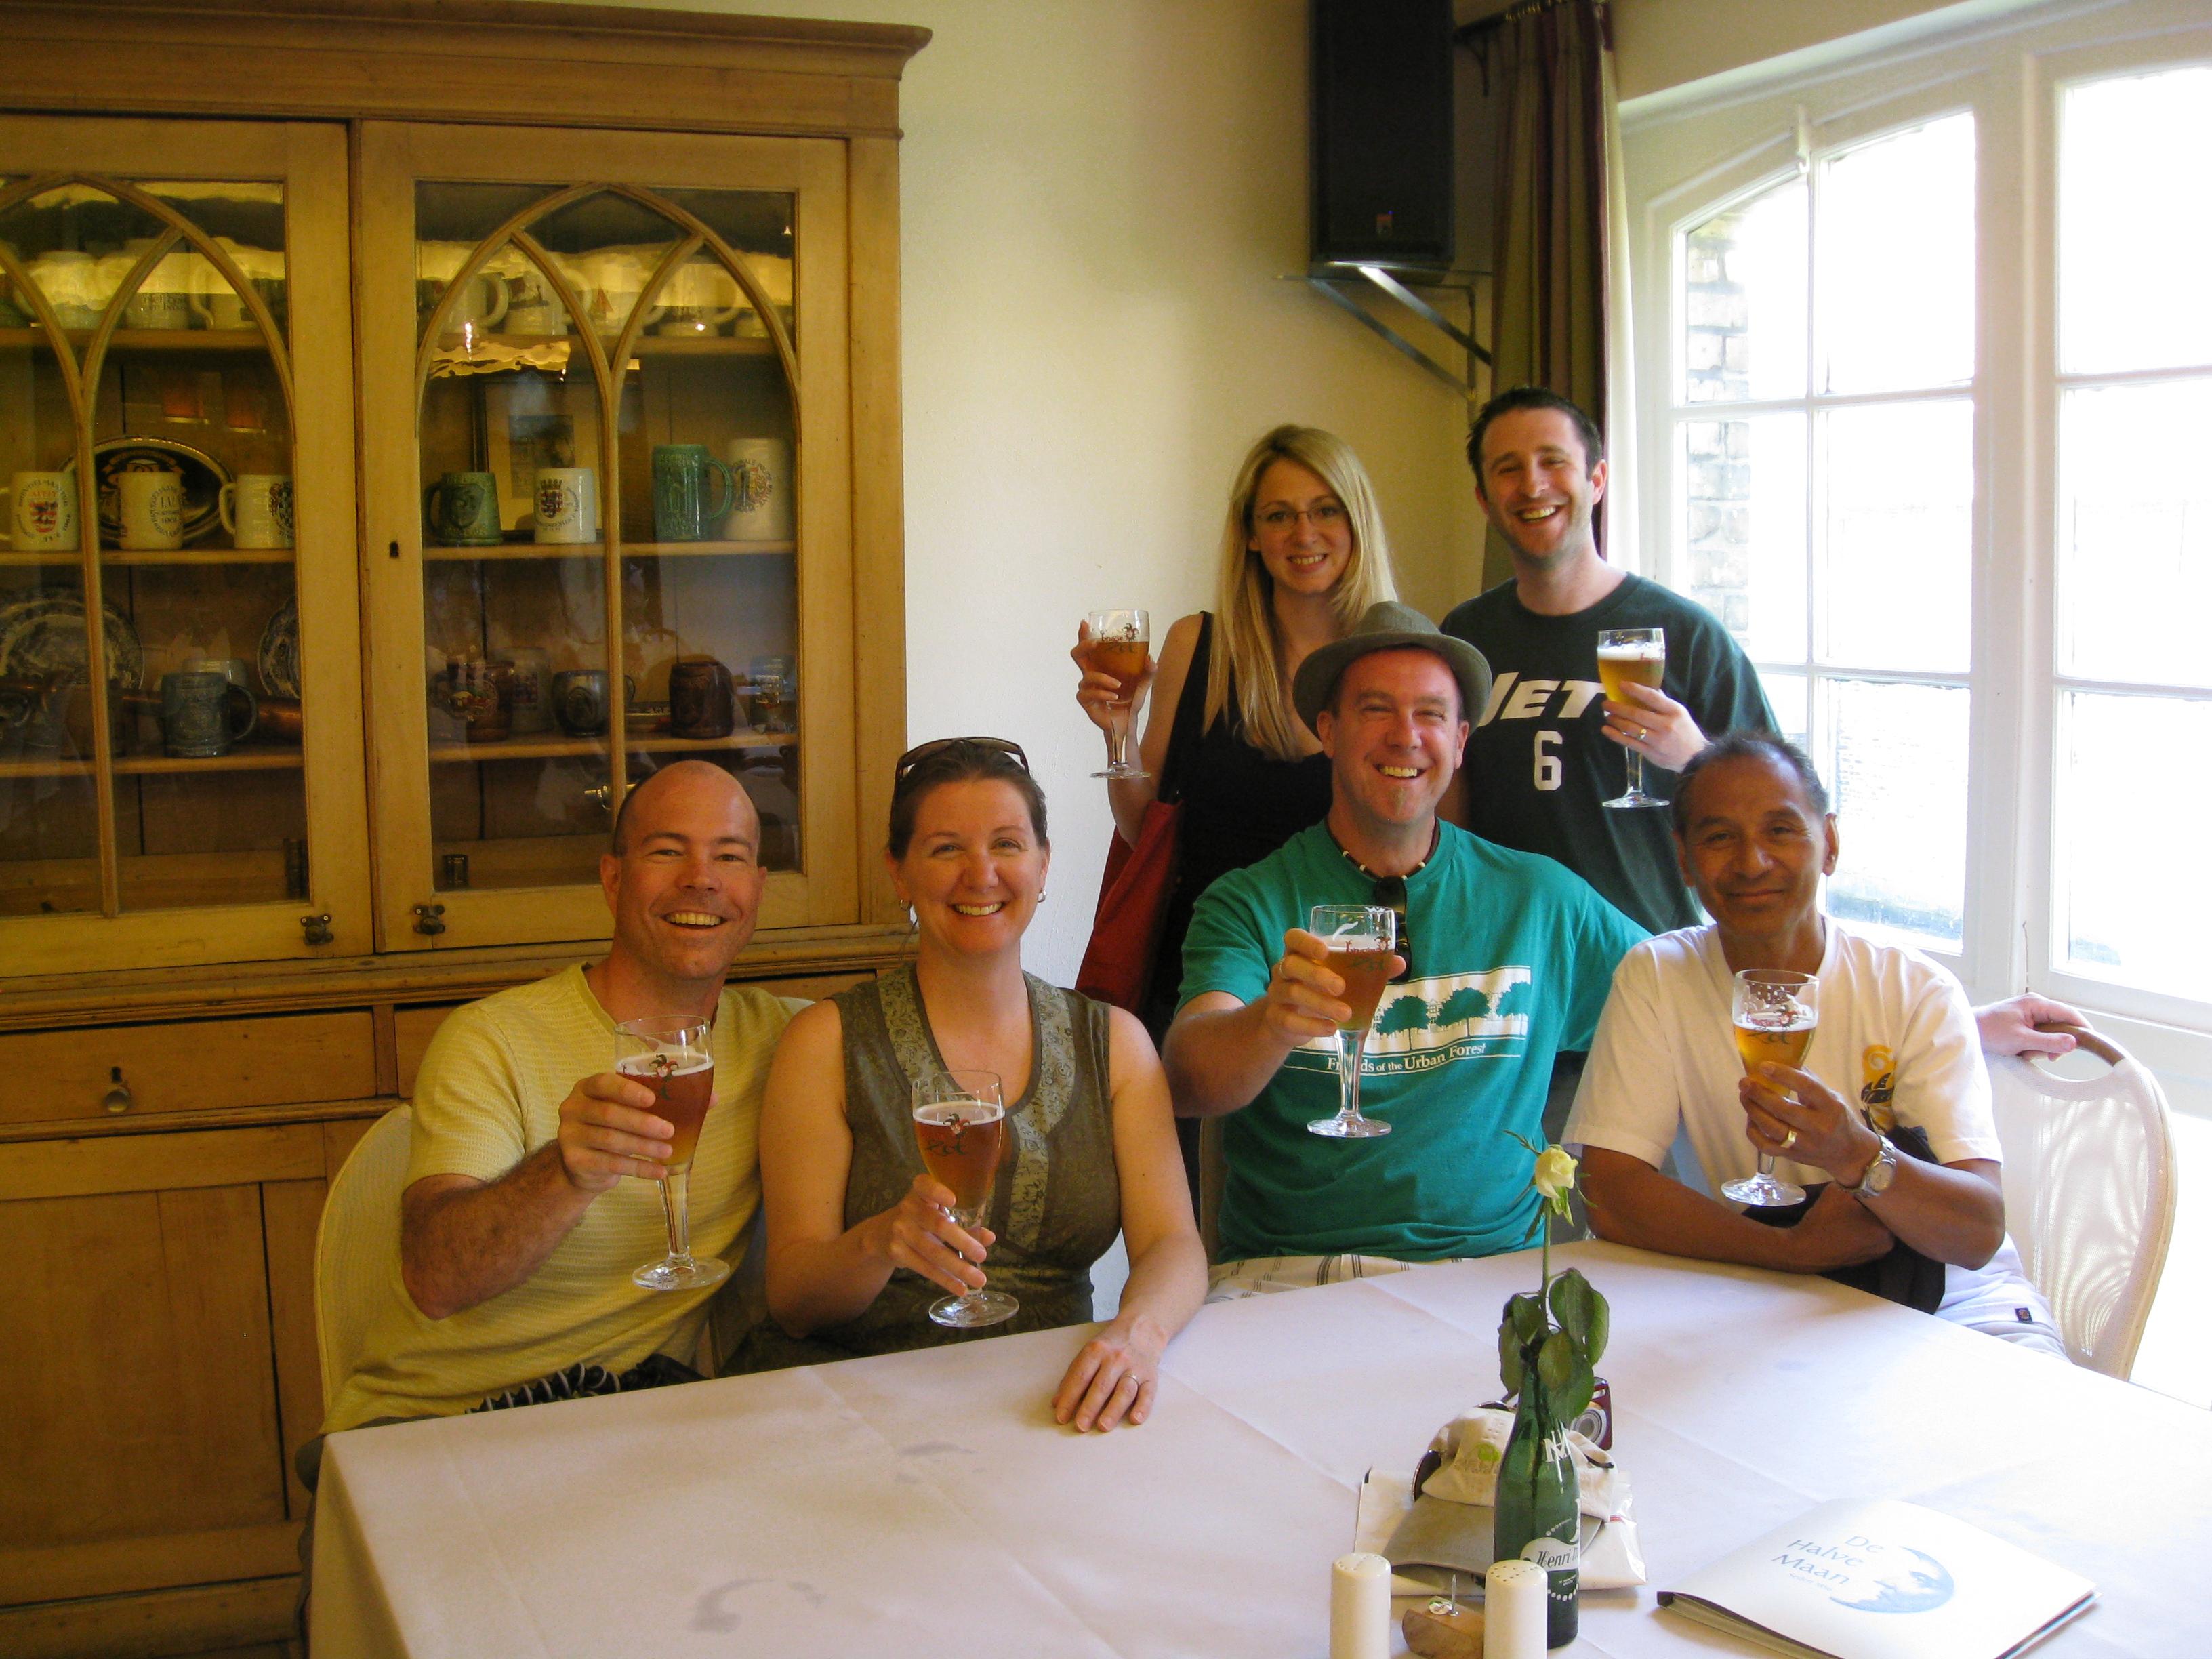 Day 2 in Brugge